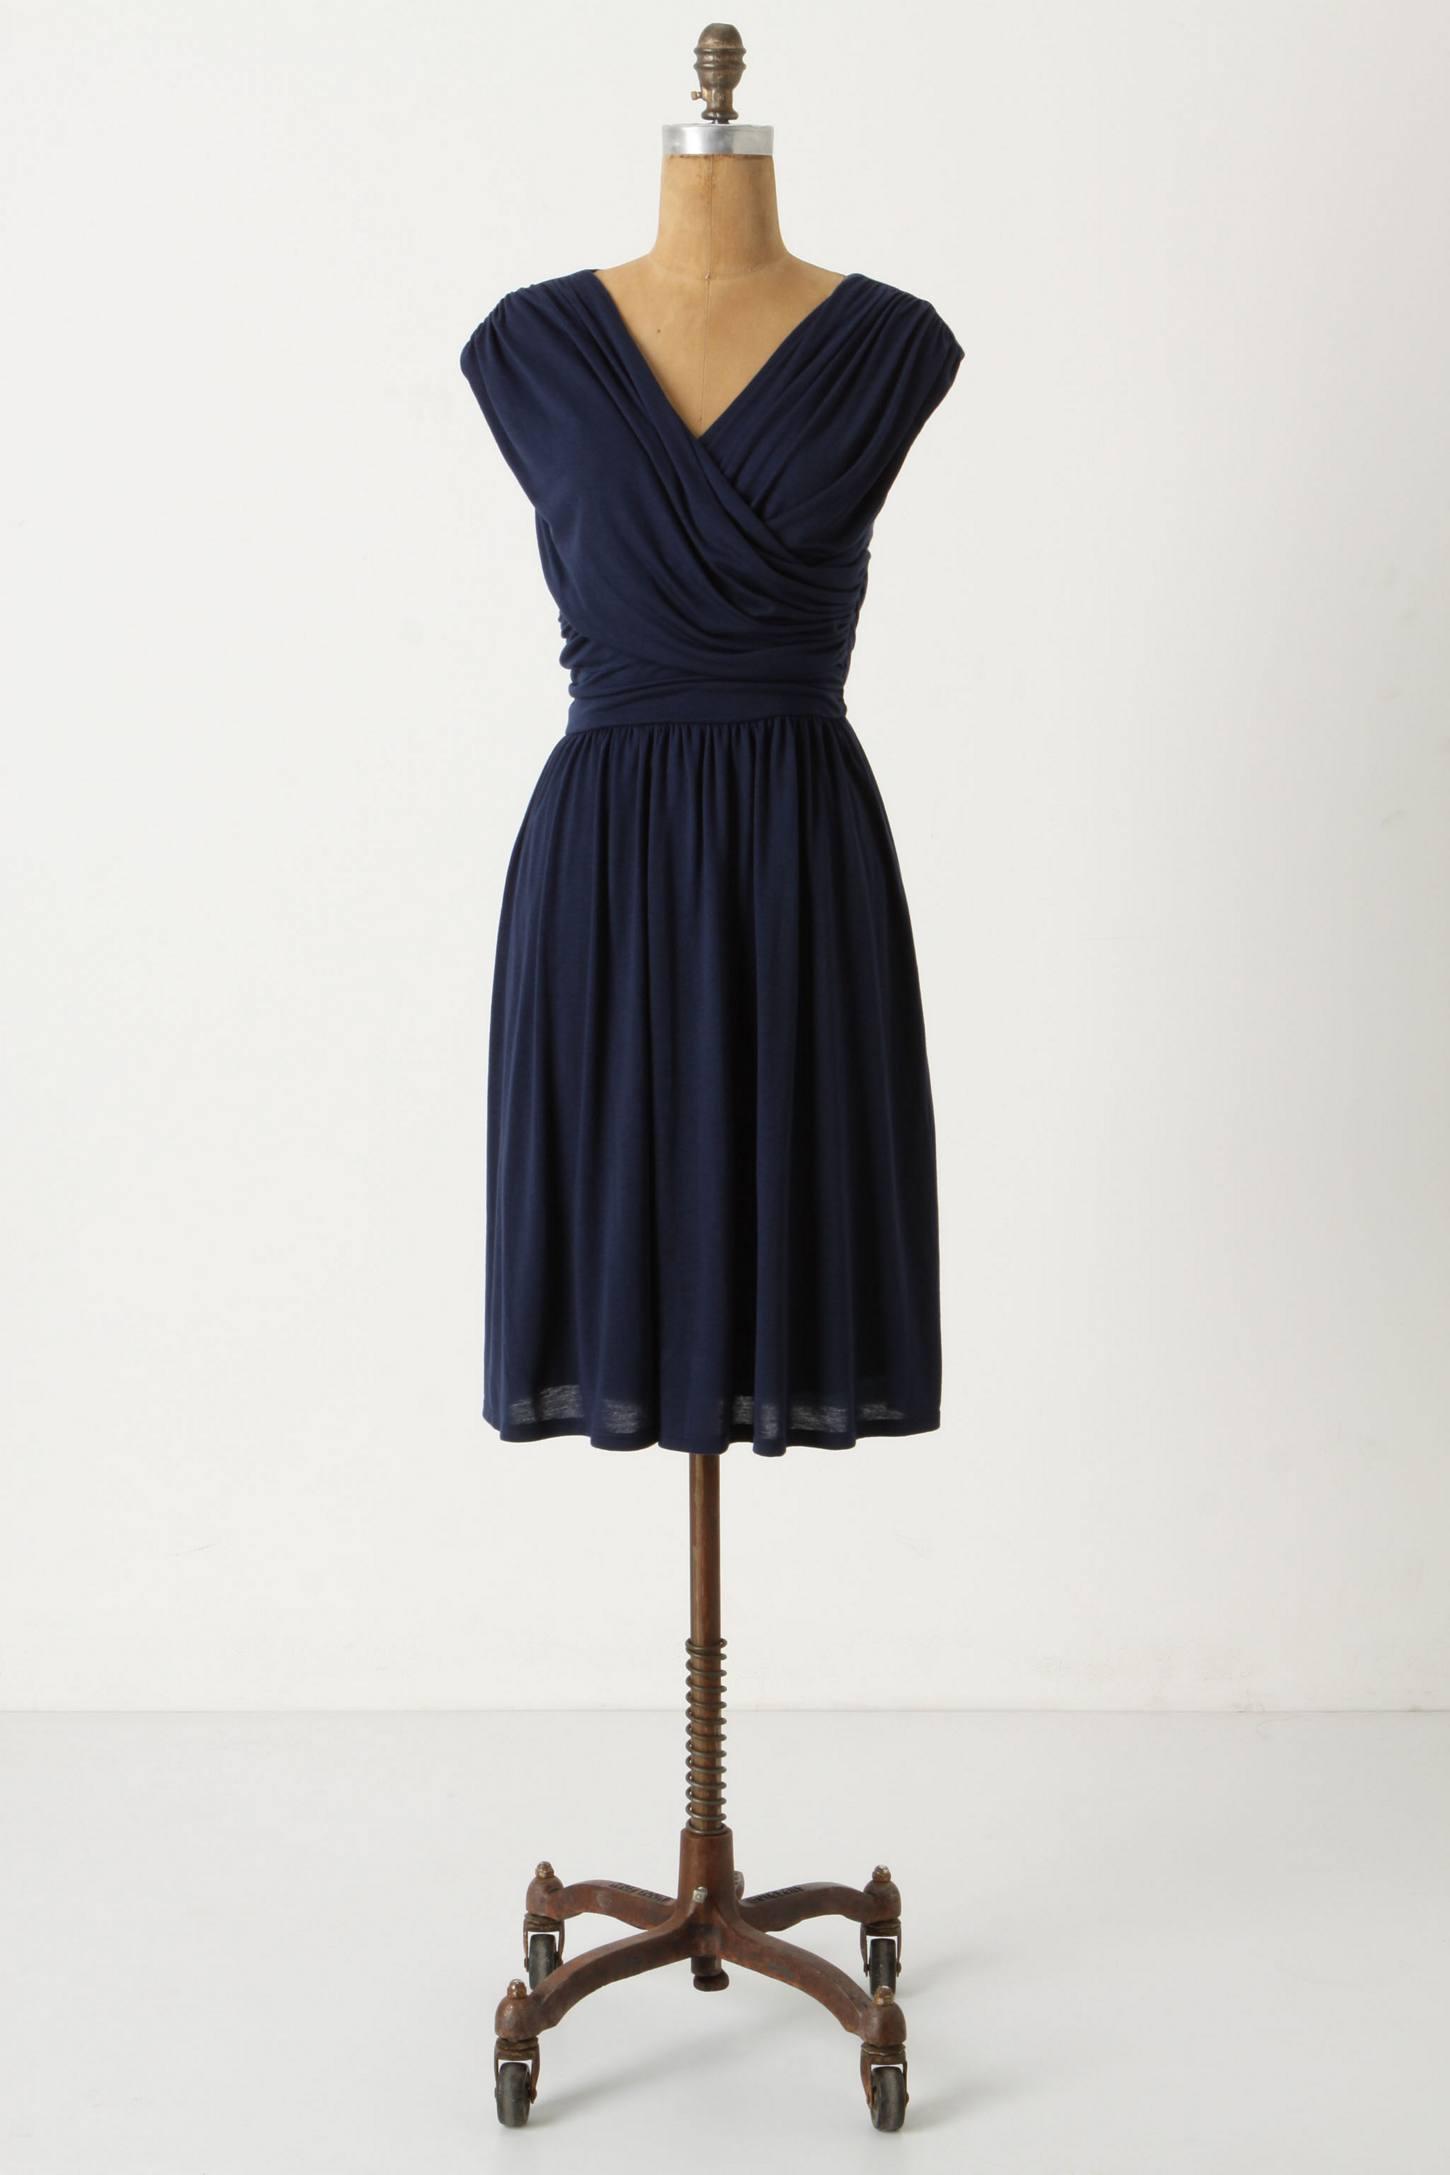 Whirligig Dress - Anthropologie.com